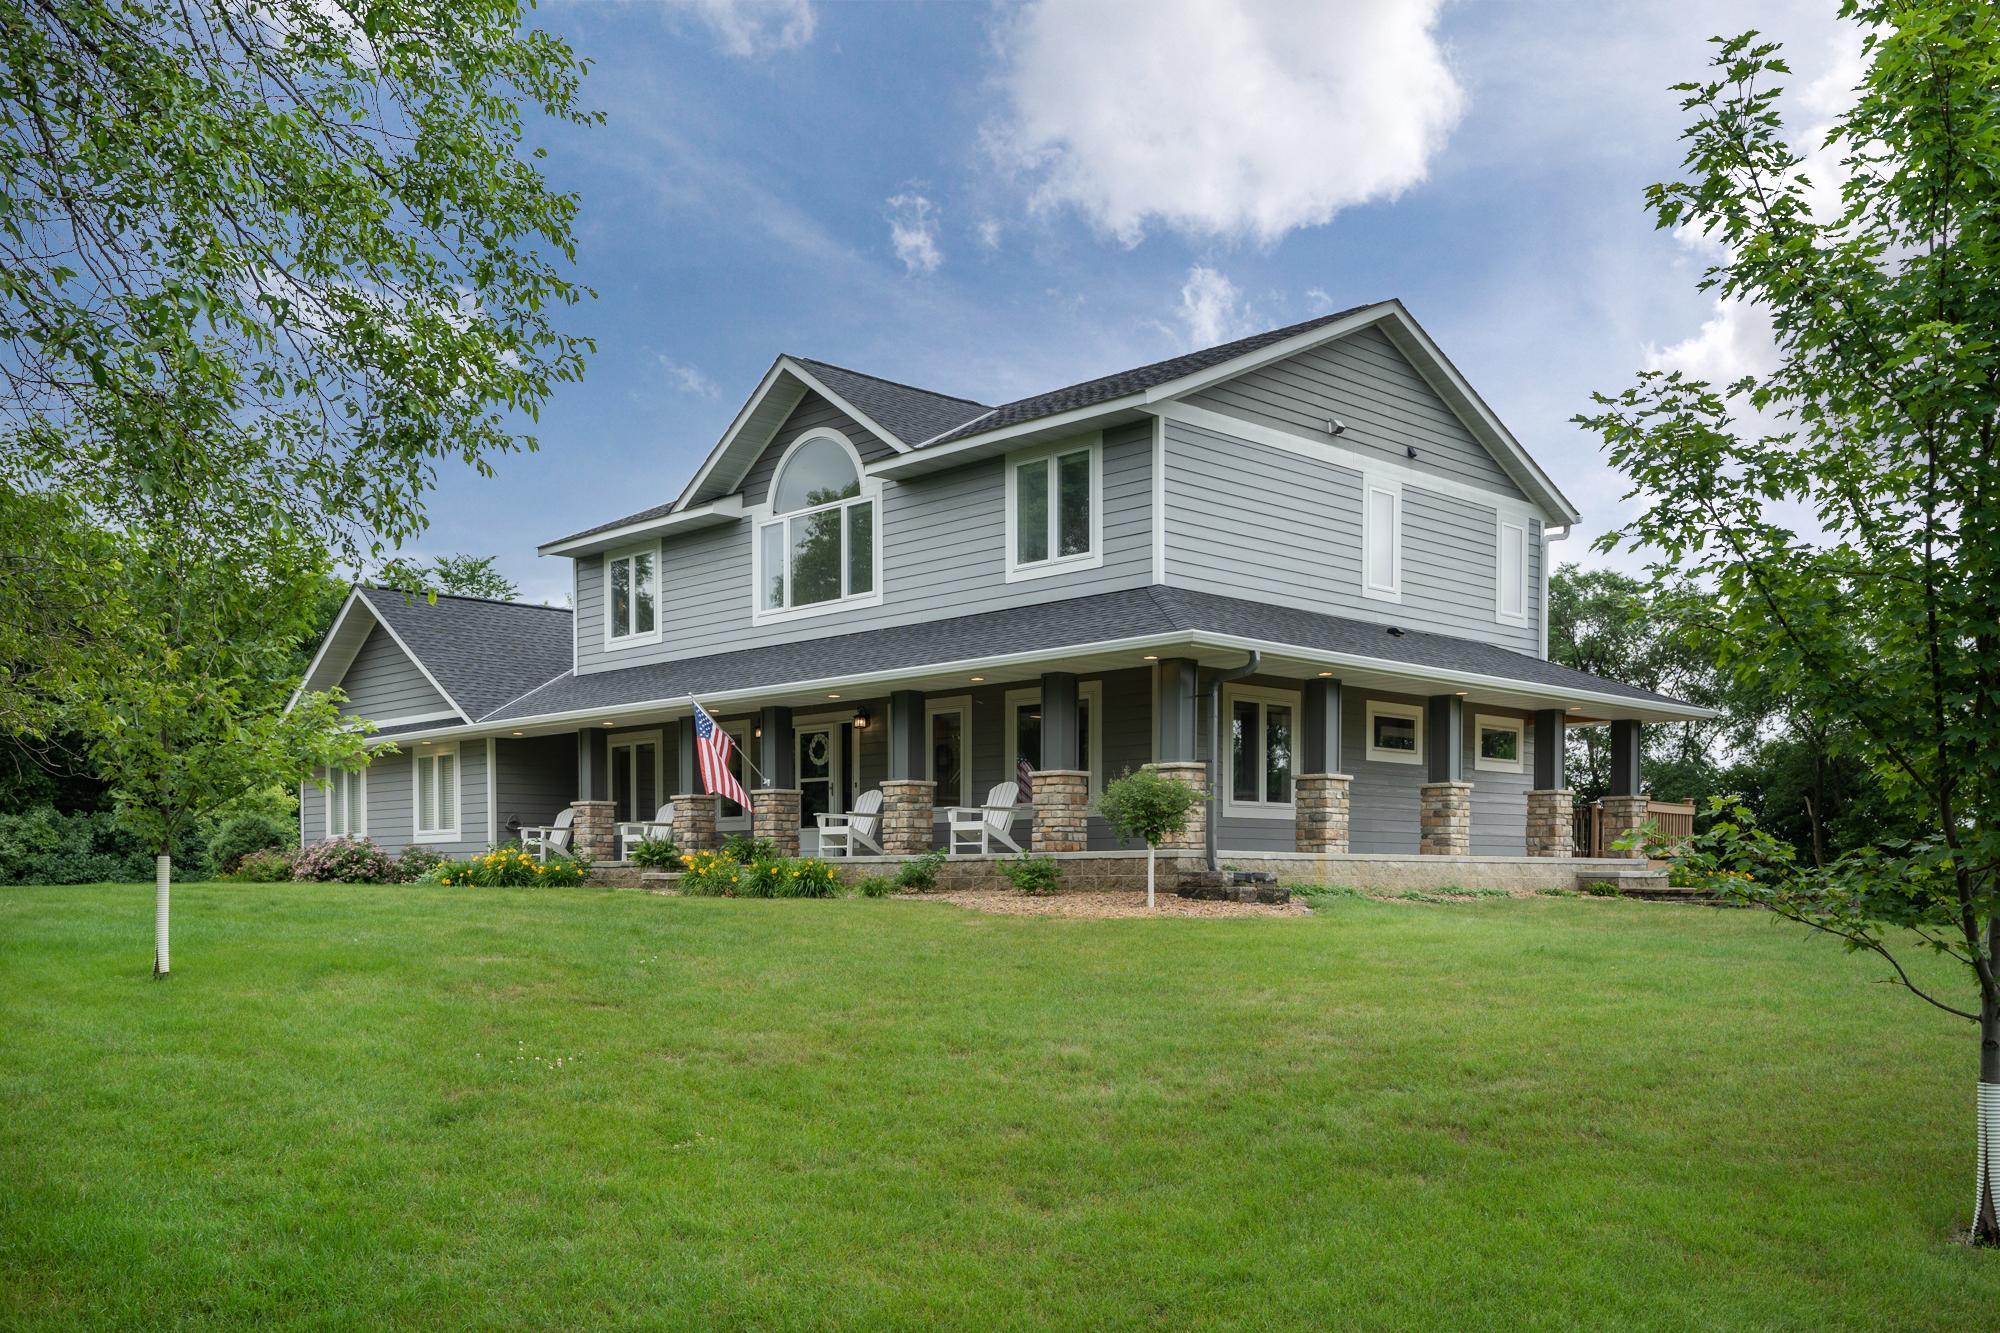 6603 161st NE Property Photo - New London, MN real estate listing